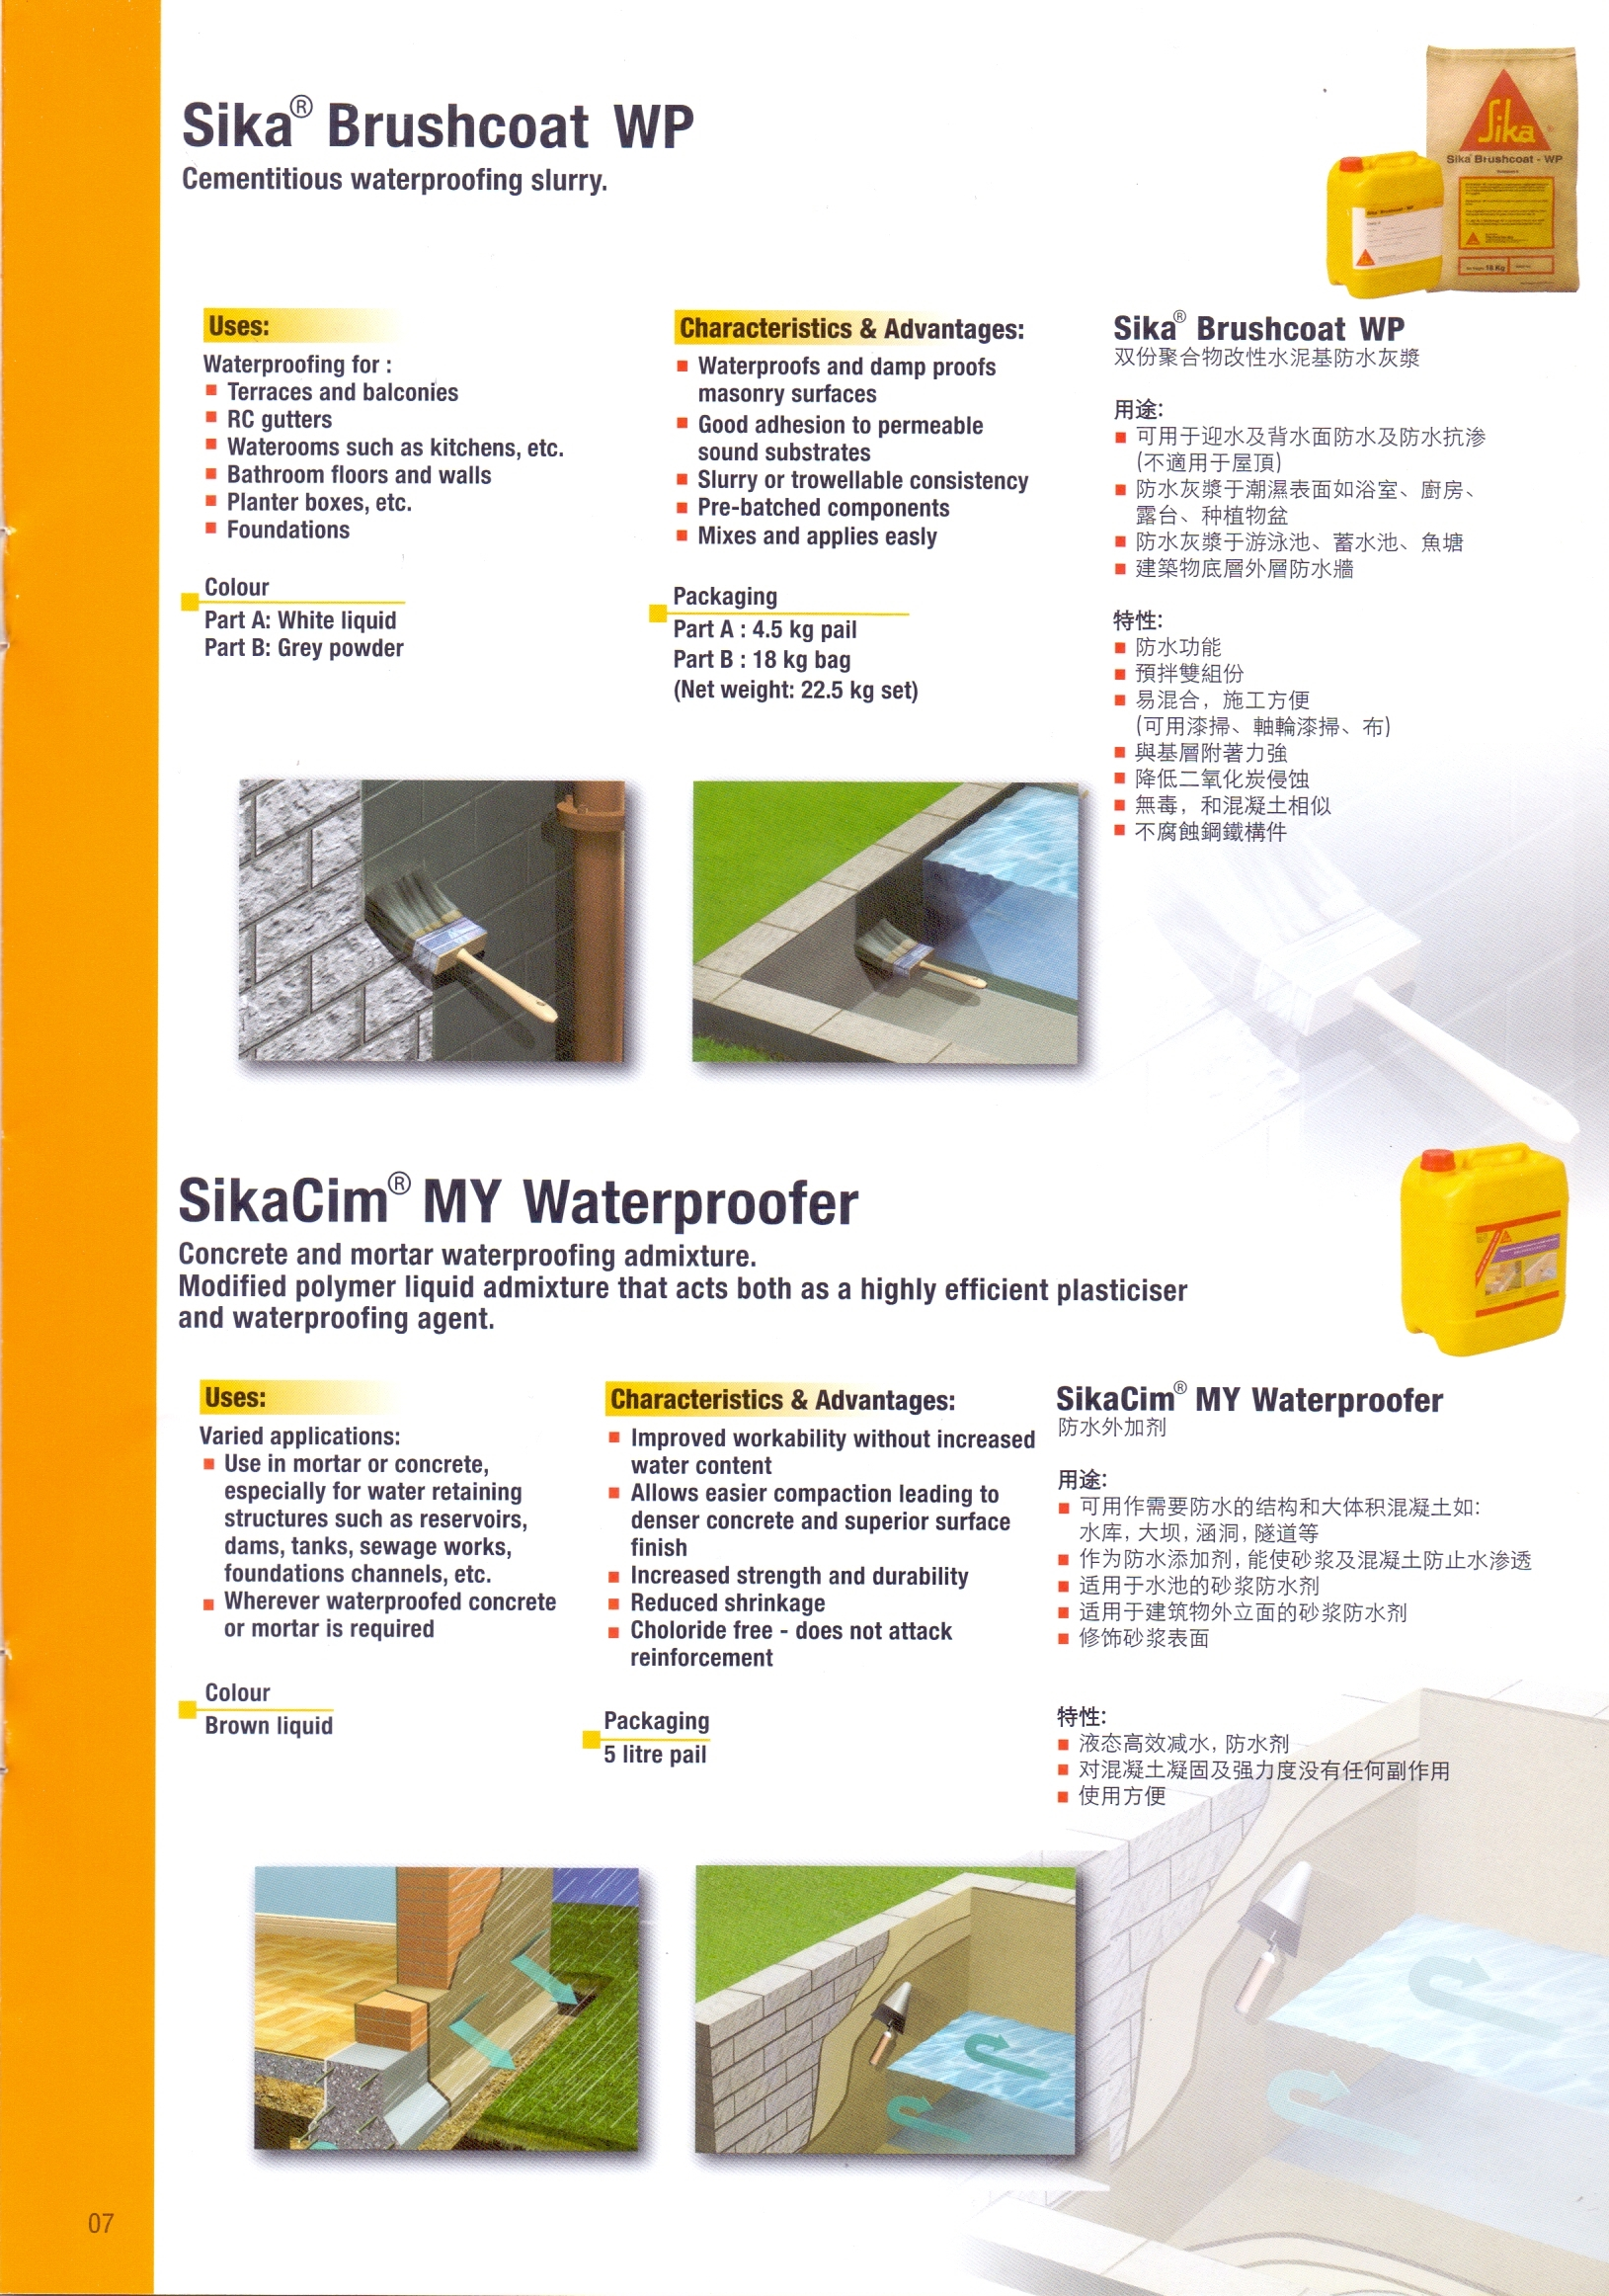 Sika Brushcoat WP   SikaCim MY Waterproofer